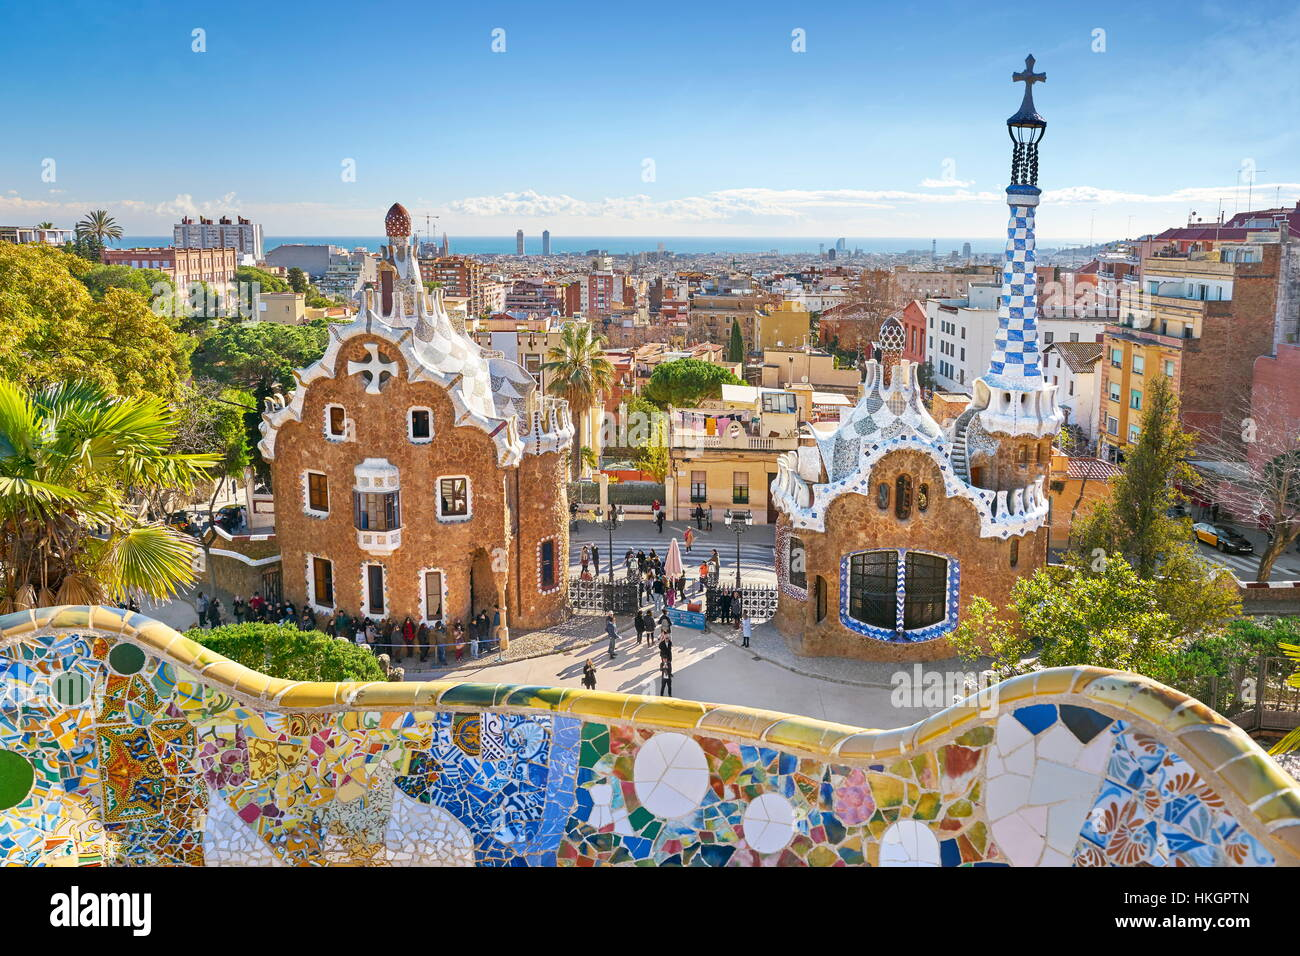 Parque Güell de Antoni Gaudí, Barcelona, España Imagen De Stock